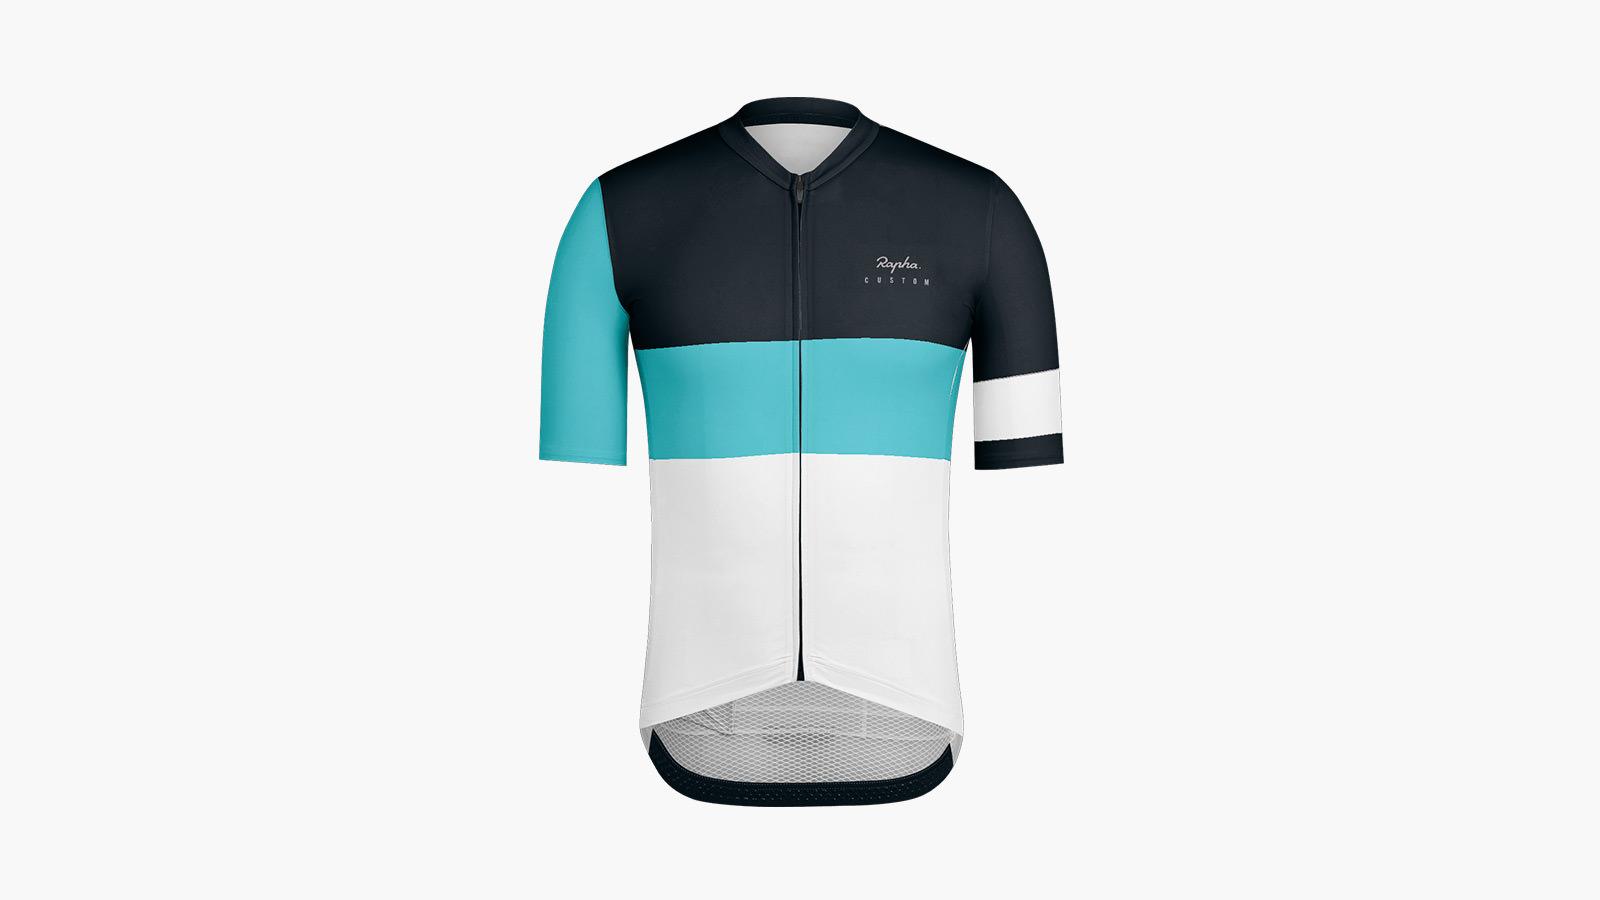 Rapha Custom Cycling Clothing